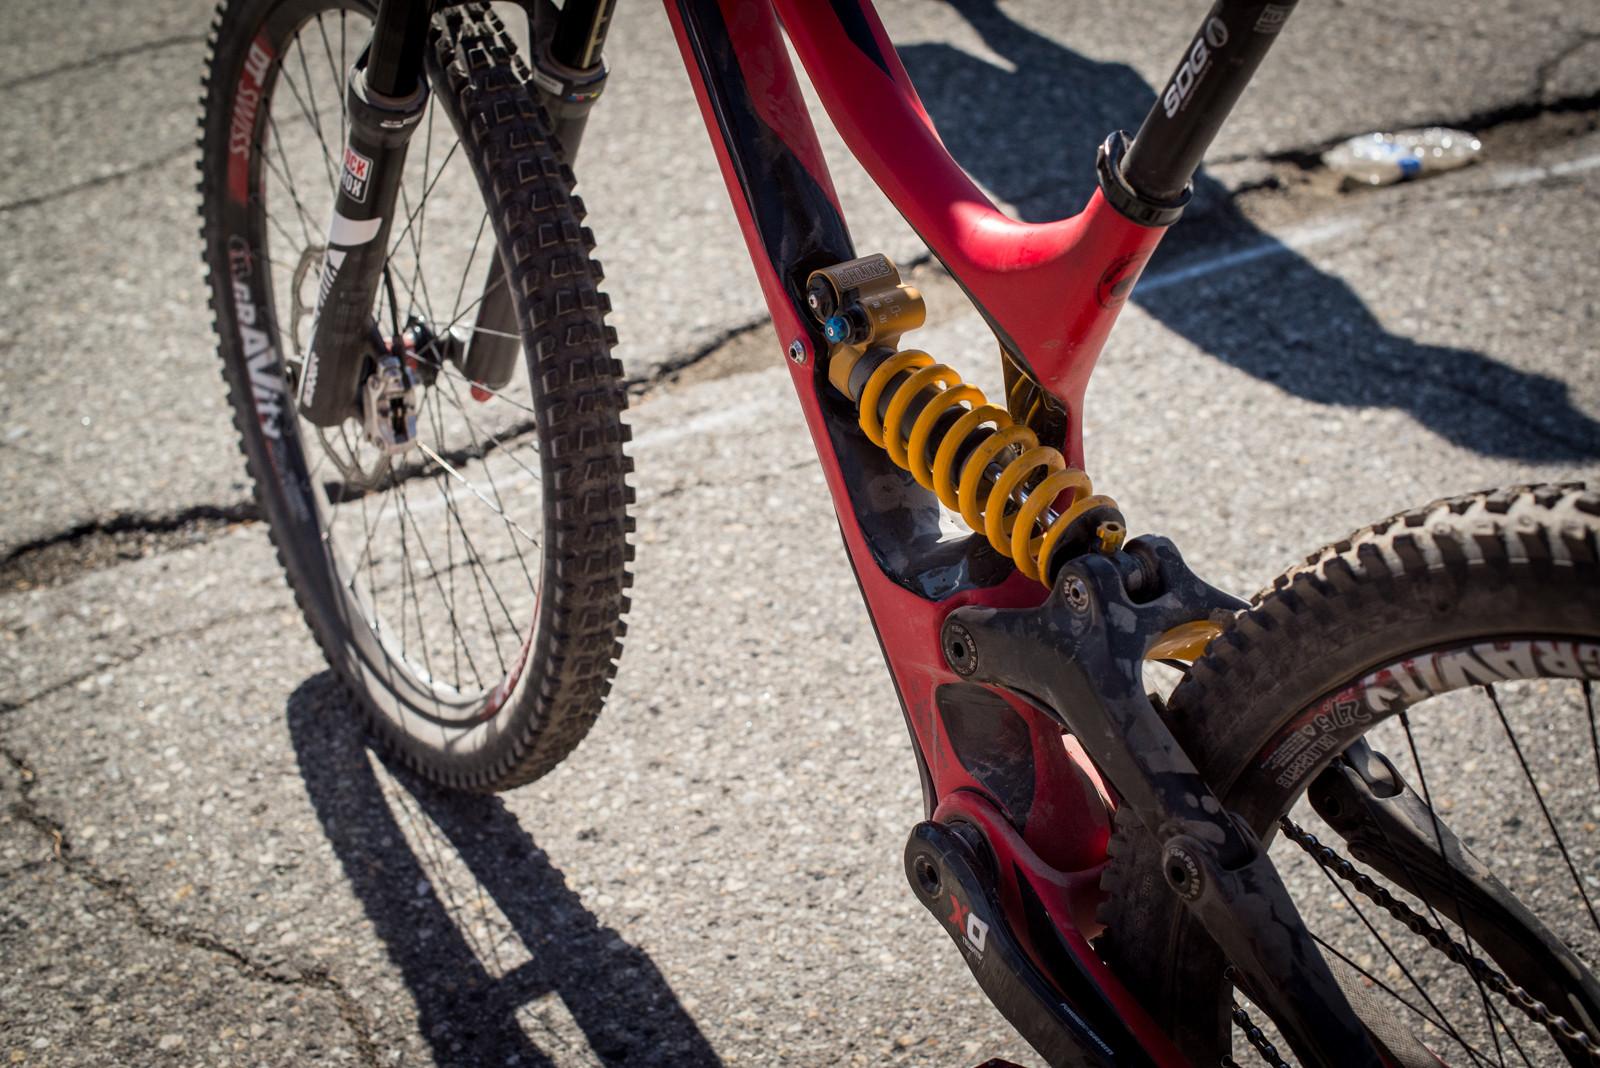 Öhlins TTX Rear Shock - Winning Bike - Mitch Ropelato's Specialized Demo 8 - Mountain Biking Pictures - Vital MTB